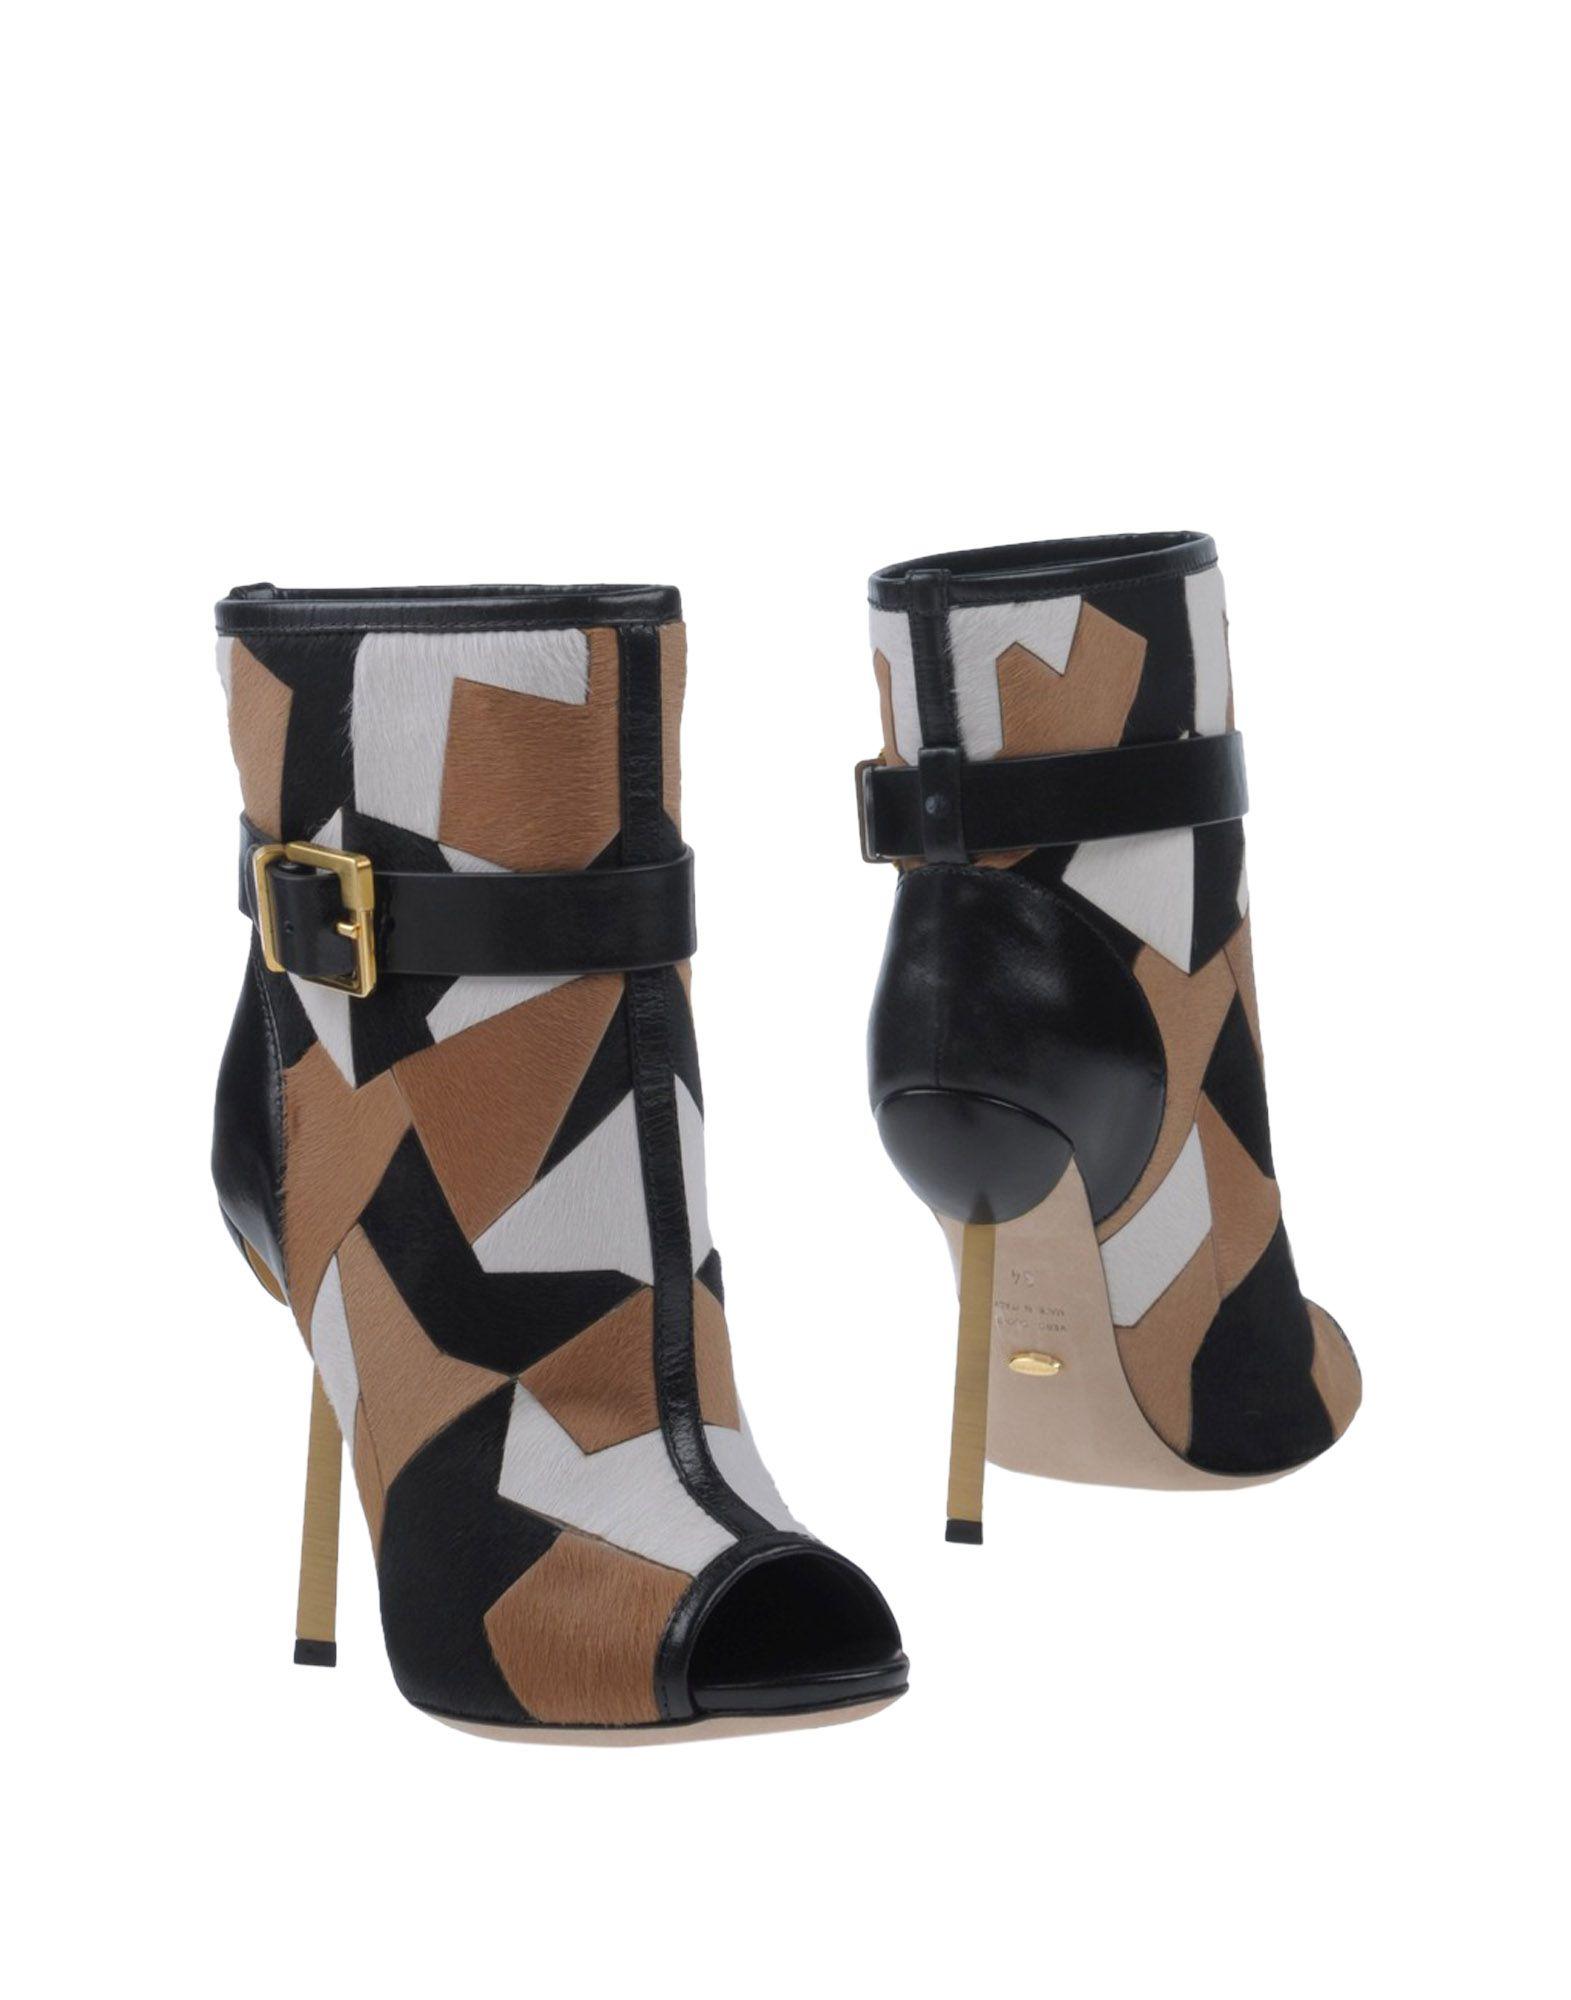 Sergio Rossi Stiefelette Damen  11394020RC Beliebte Schuhe